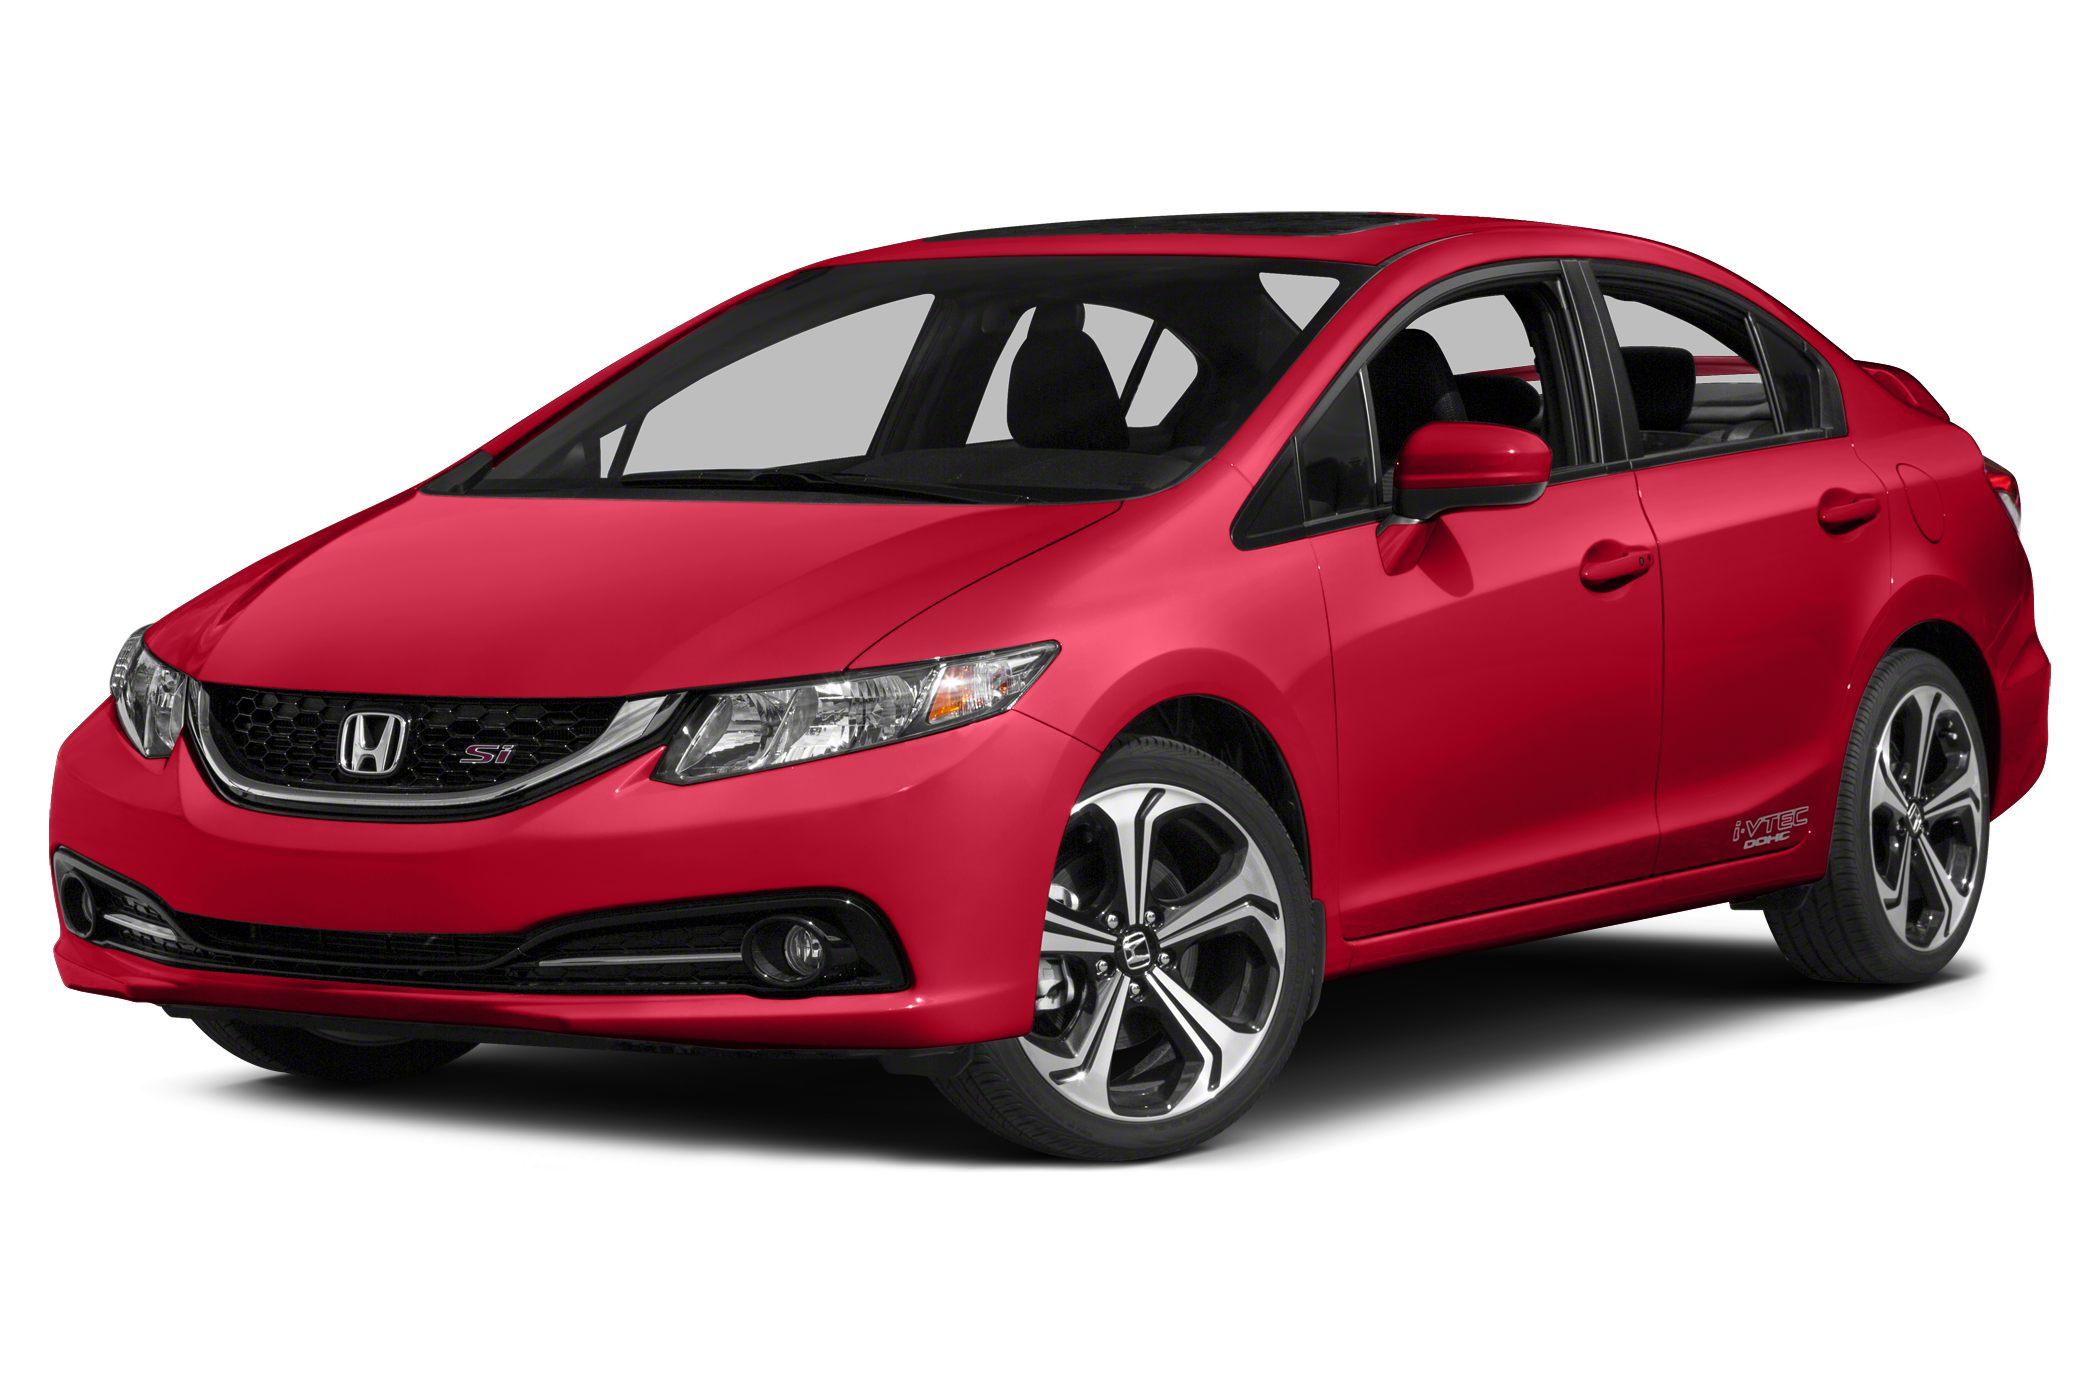 2014 Honda Civic Si Miles 46145Color Crystal Black Pearl Stock 700593 VIN